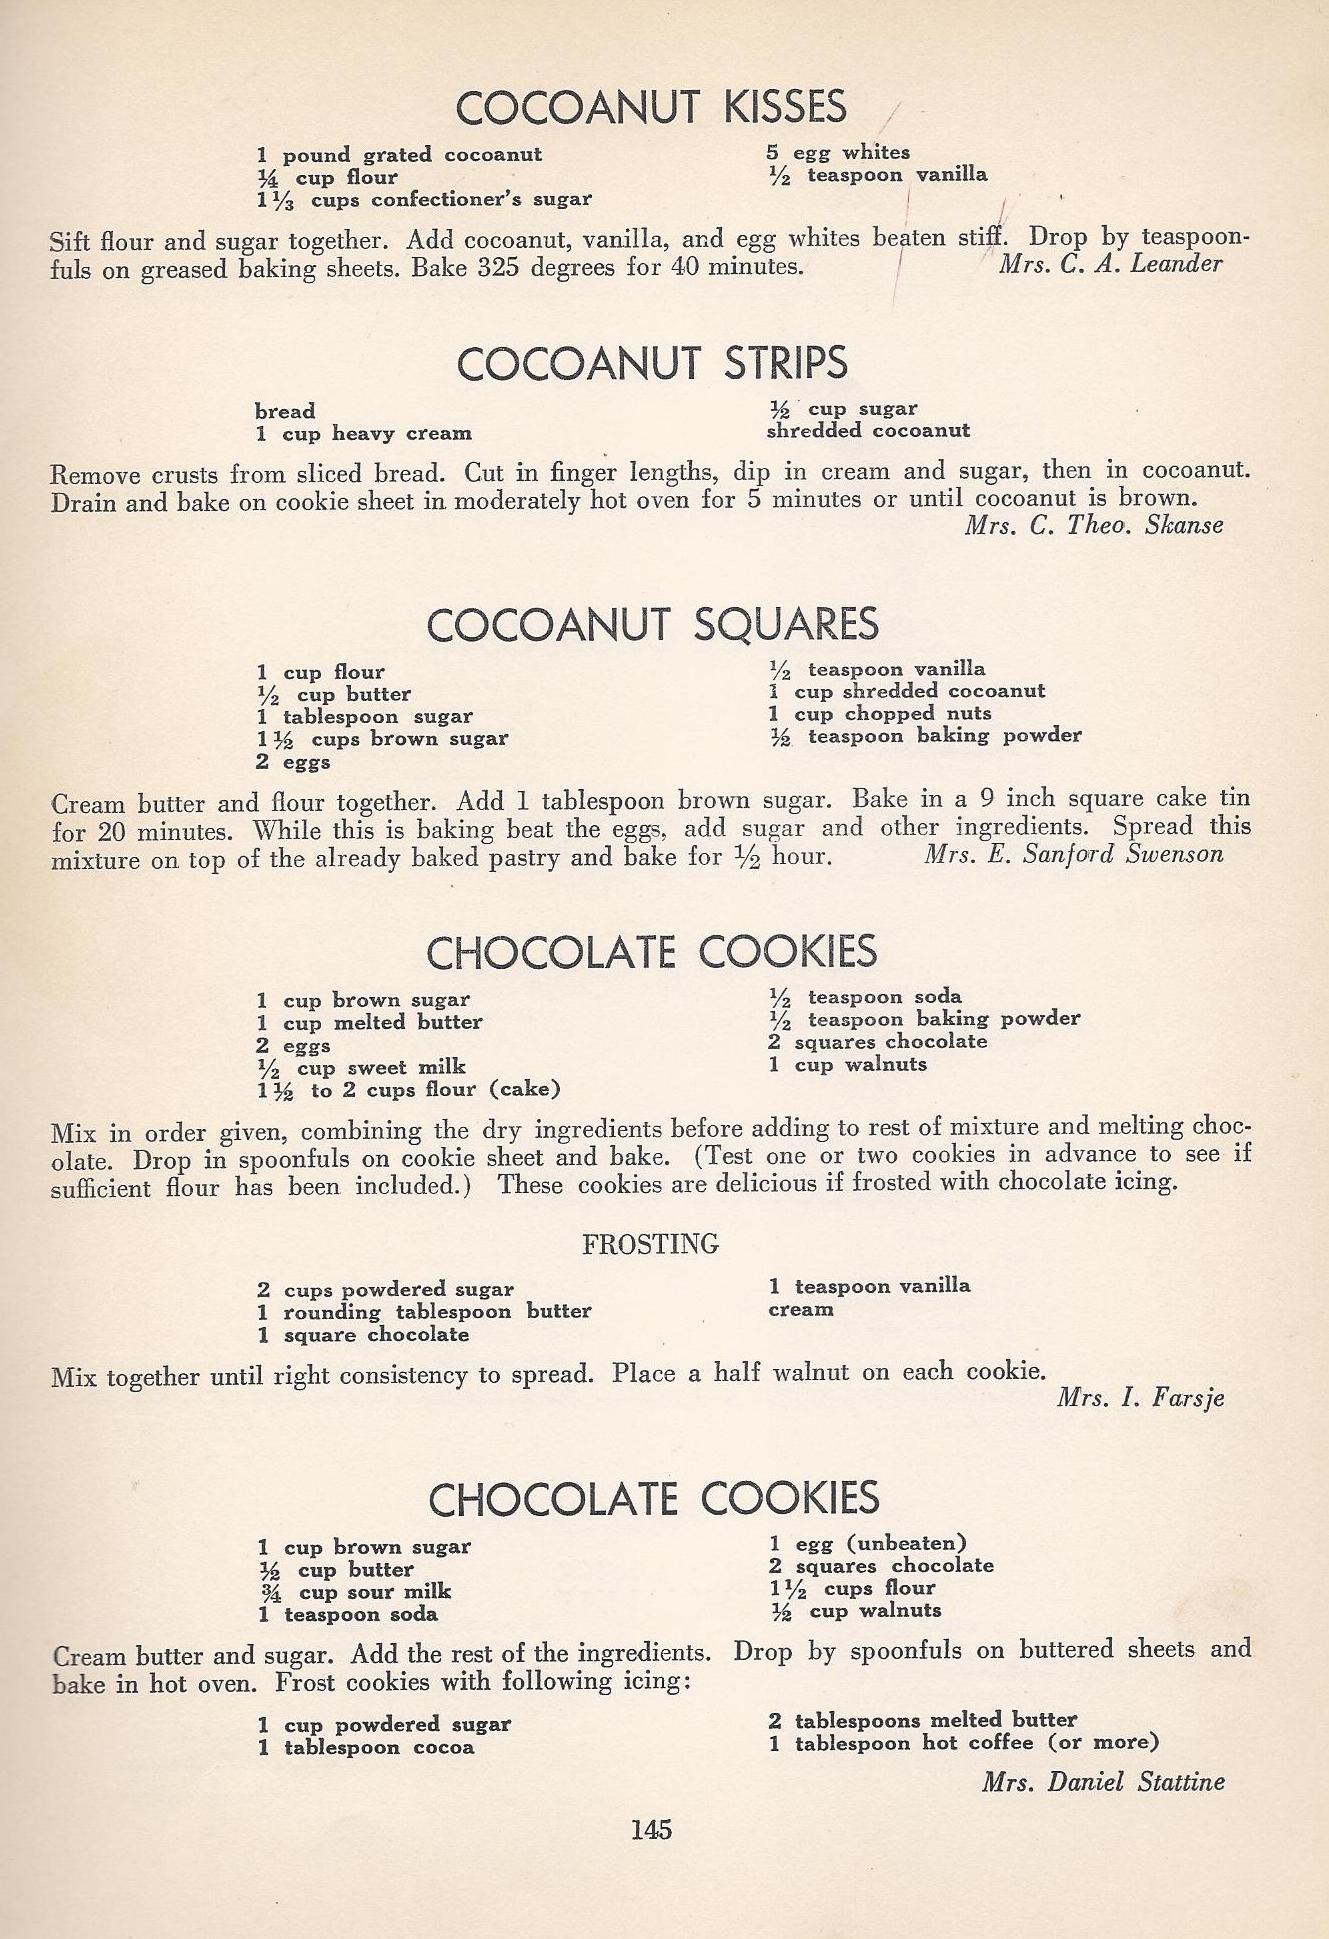 Vintage Cookies8 Vintage Recipes Cookie Recipes Old Recipes